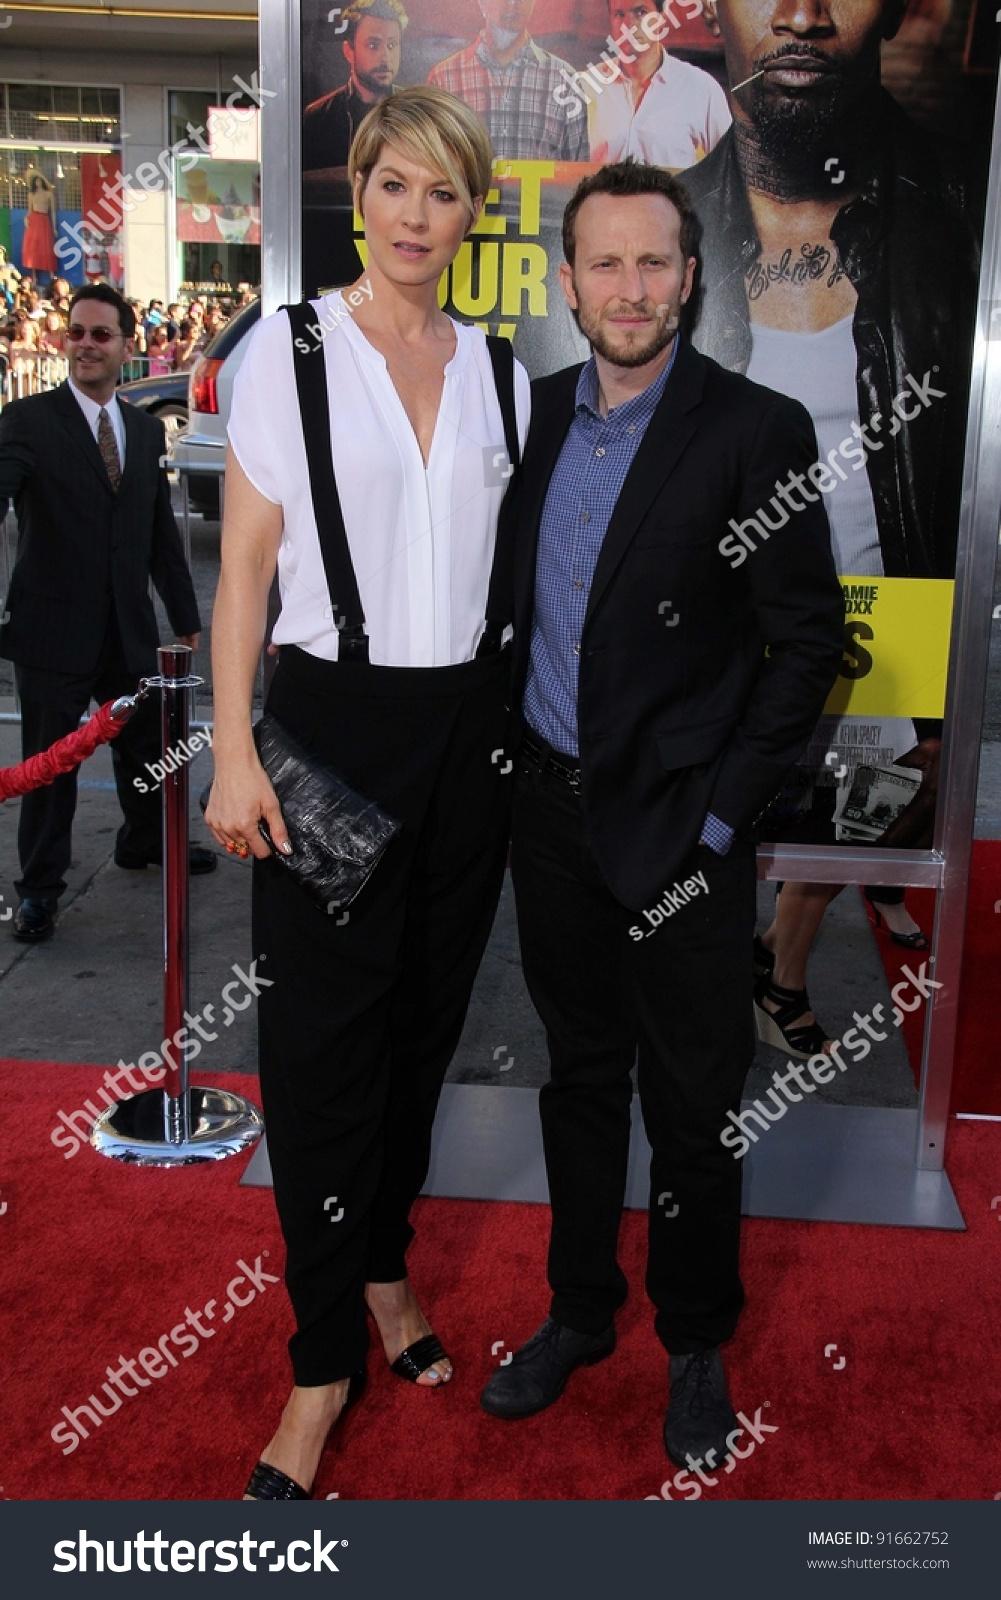 Jenna Elfman Bodhi Elfman At The Horrible Bosses Los Angeles